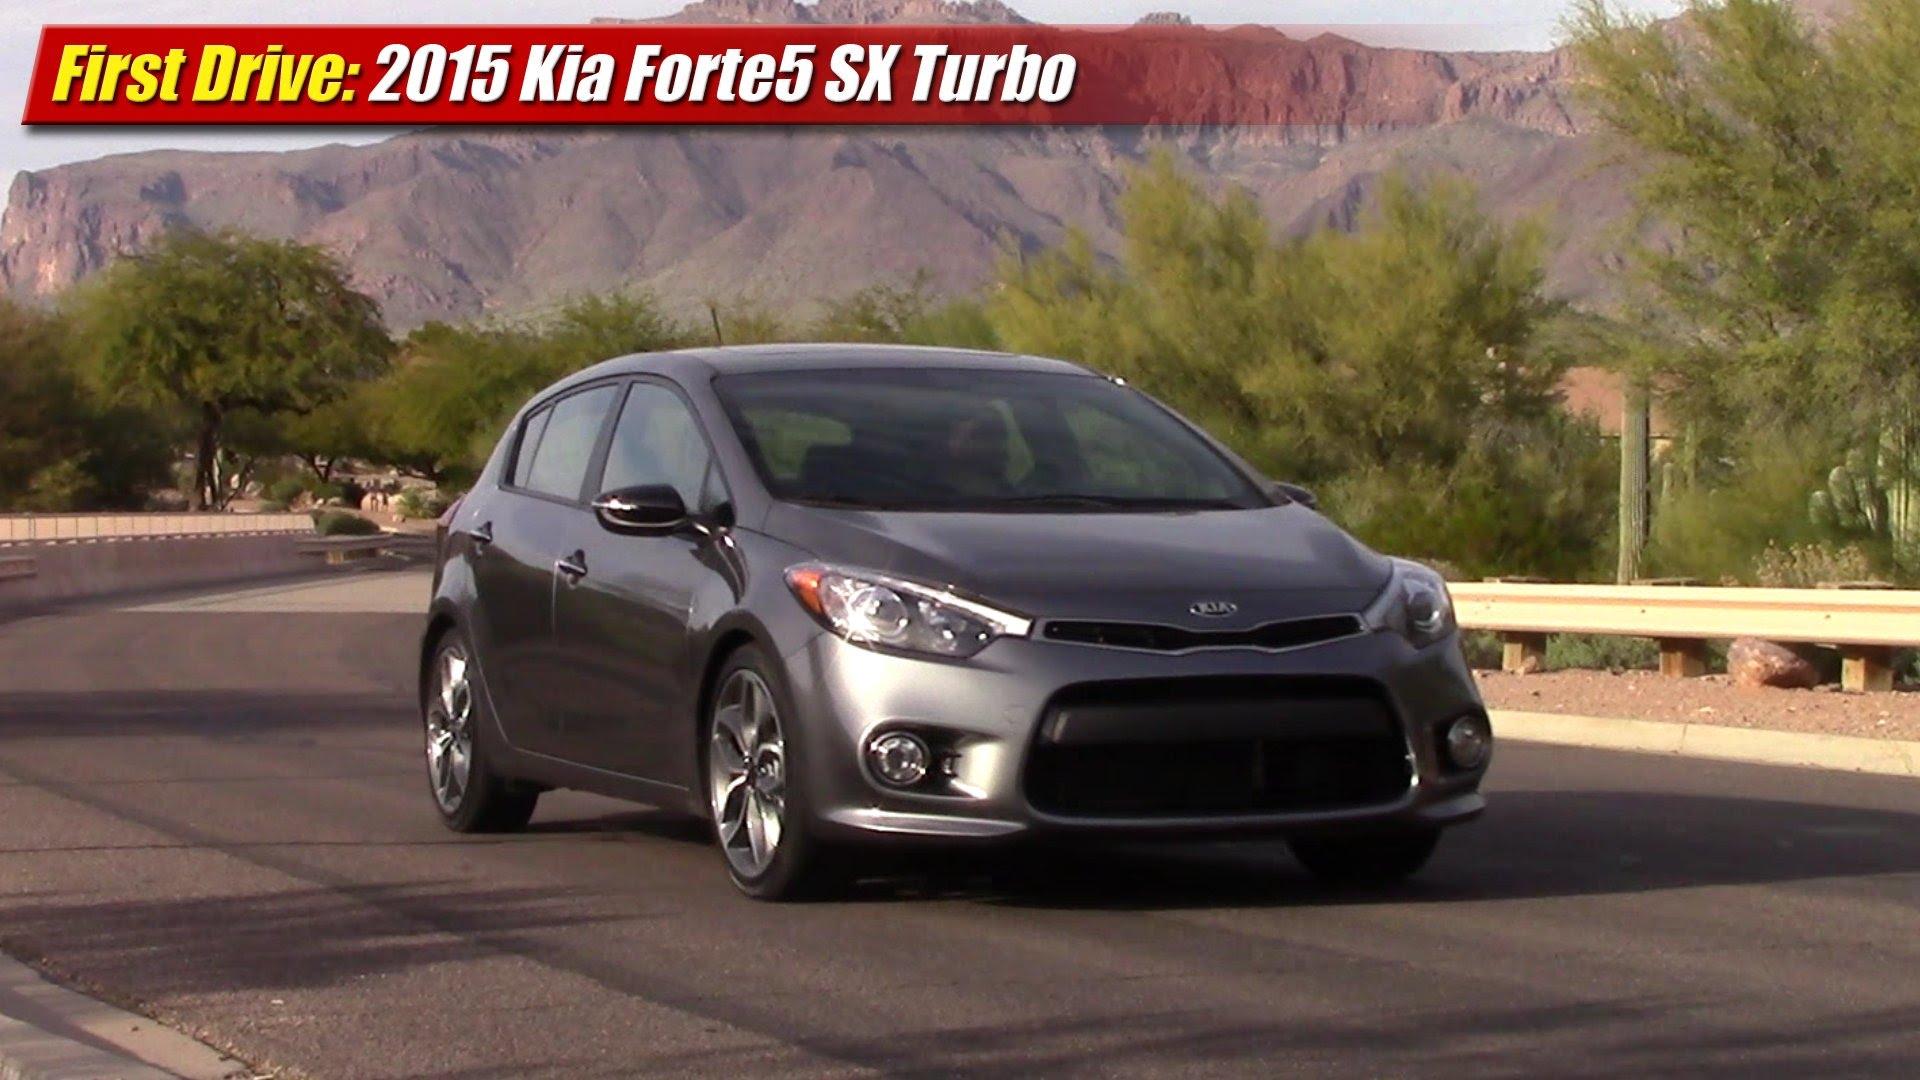 First Drive 2017 Kia Forte5 Sx Turbo